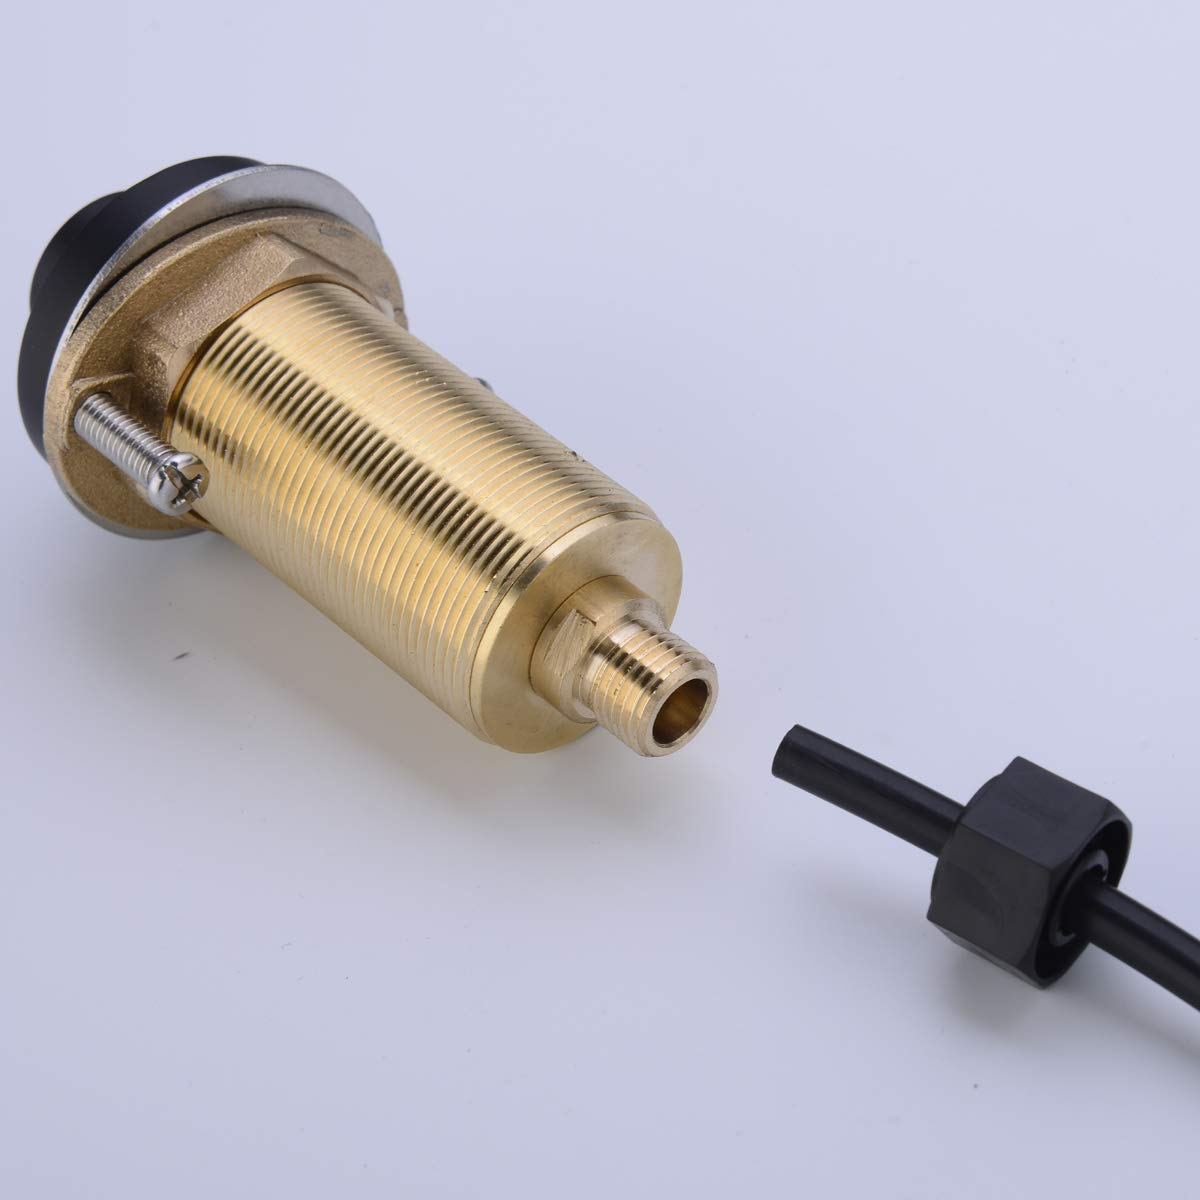 SINKINGDOM SinkTop Air Switch Kit (Full Brass) for Garbage Disposal, Cordless (Matte Black) by SINKINGDOM (Image #4)